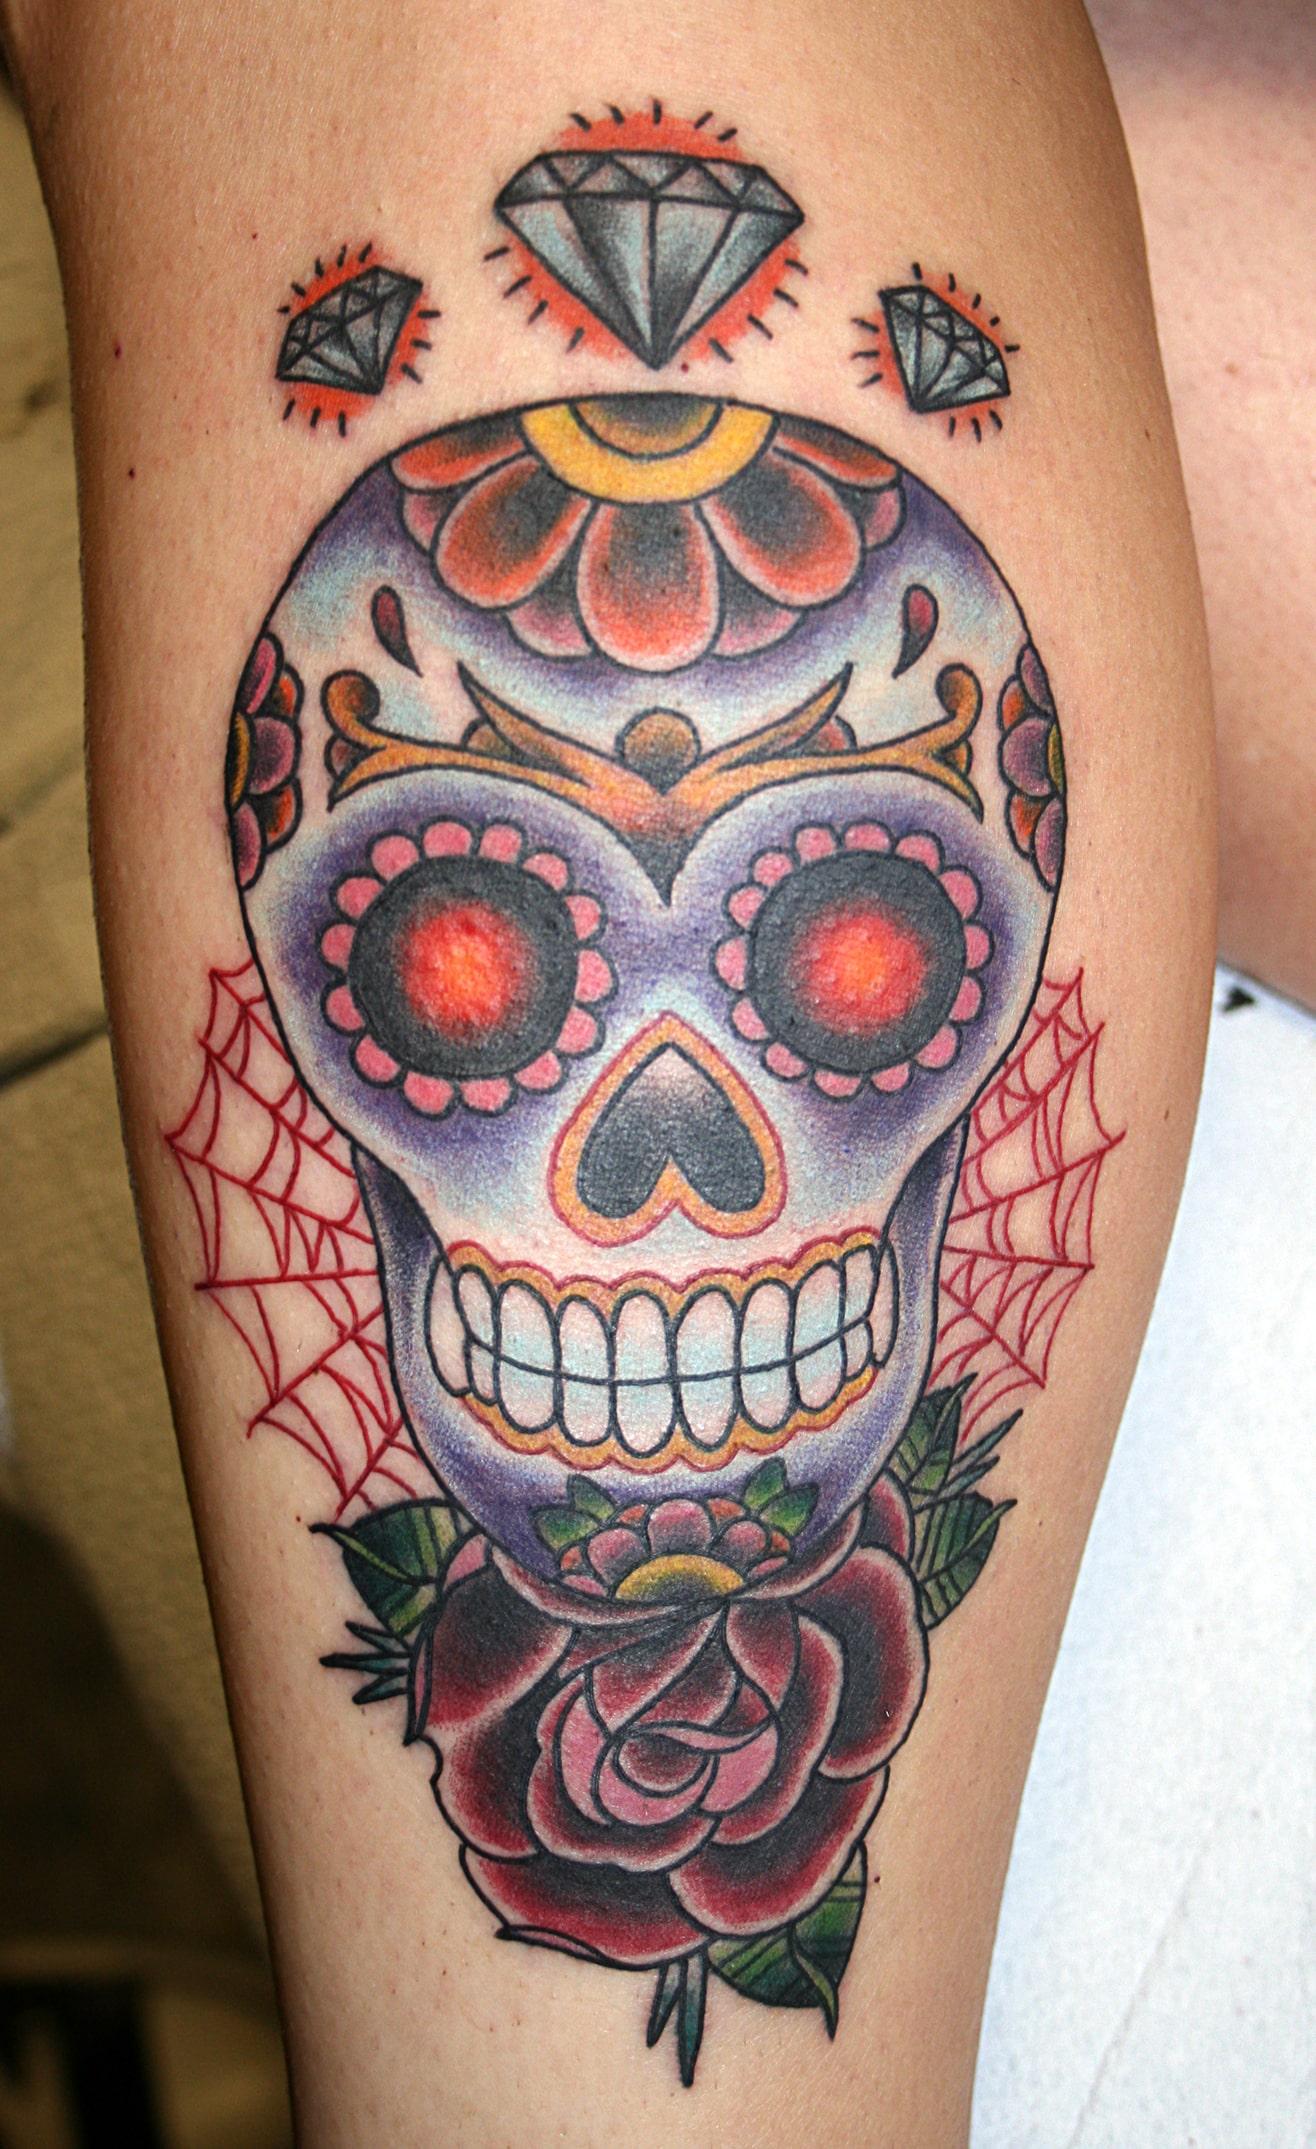 Tattoo Stencils For Women: 33 Crazily Gorgeous Sugar Skull Tattoos -DesignBump